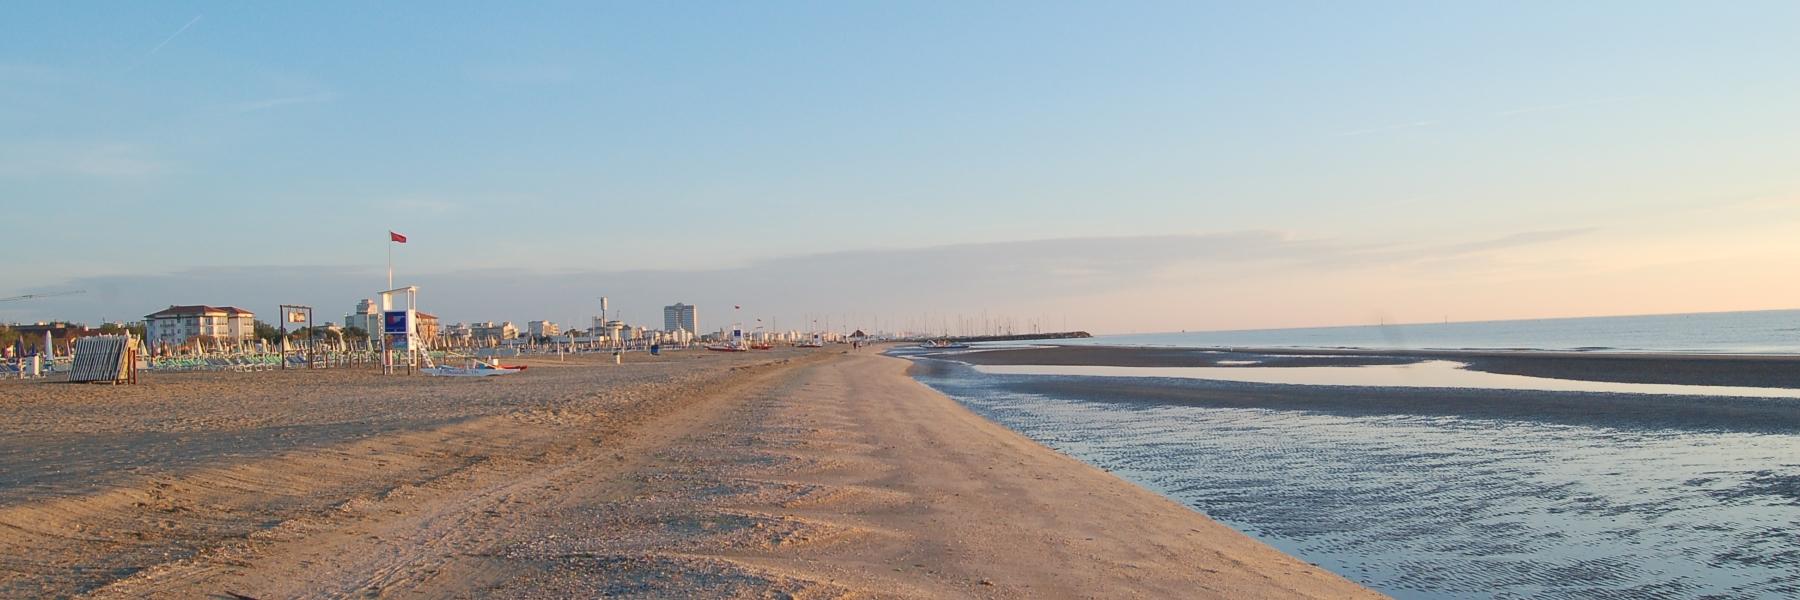 9 km of WiFi beach network